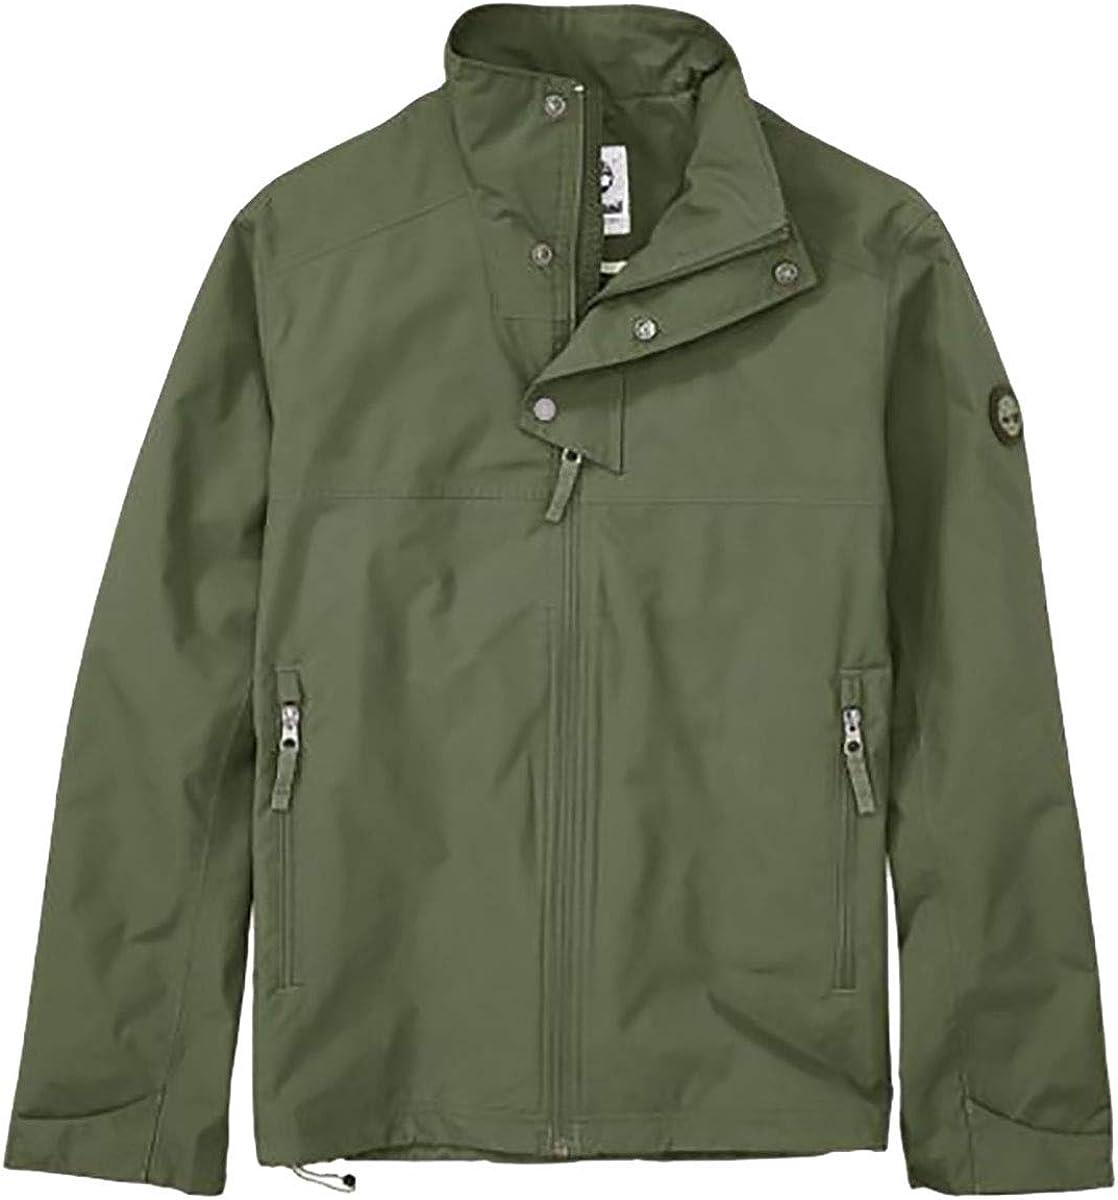 único emprender Indica  Timberland Men's MT. Crescent Waterproof Olive Night Rain Jacket - Green -  Medium: Amazon.co.uk: Clothing